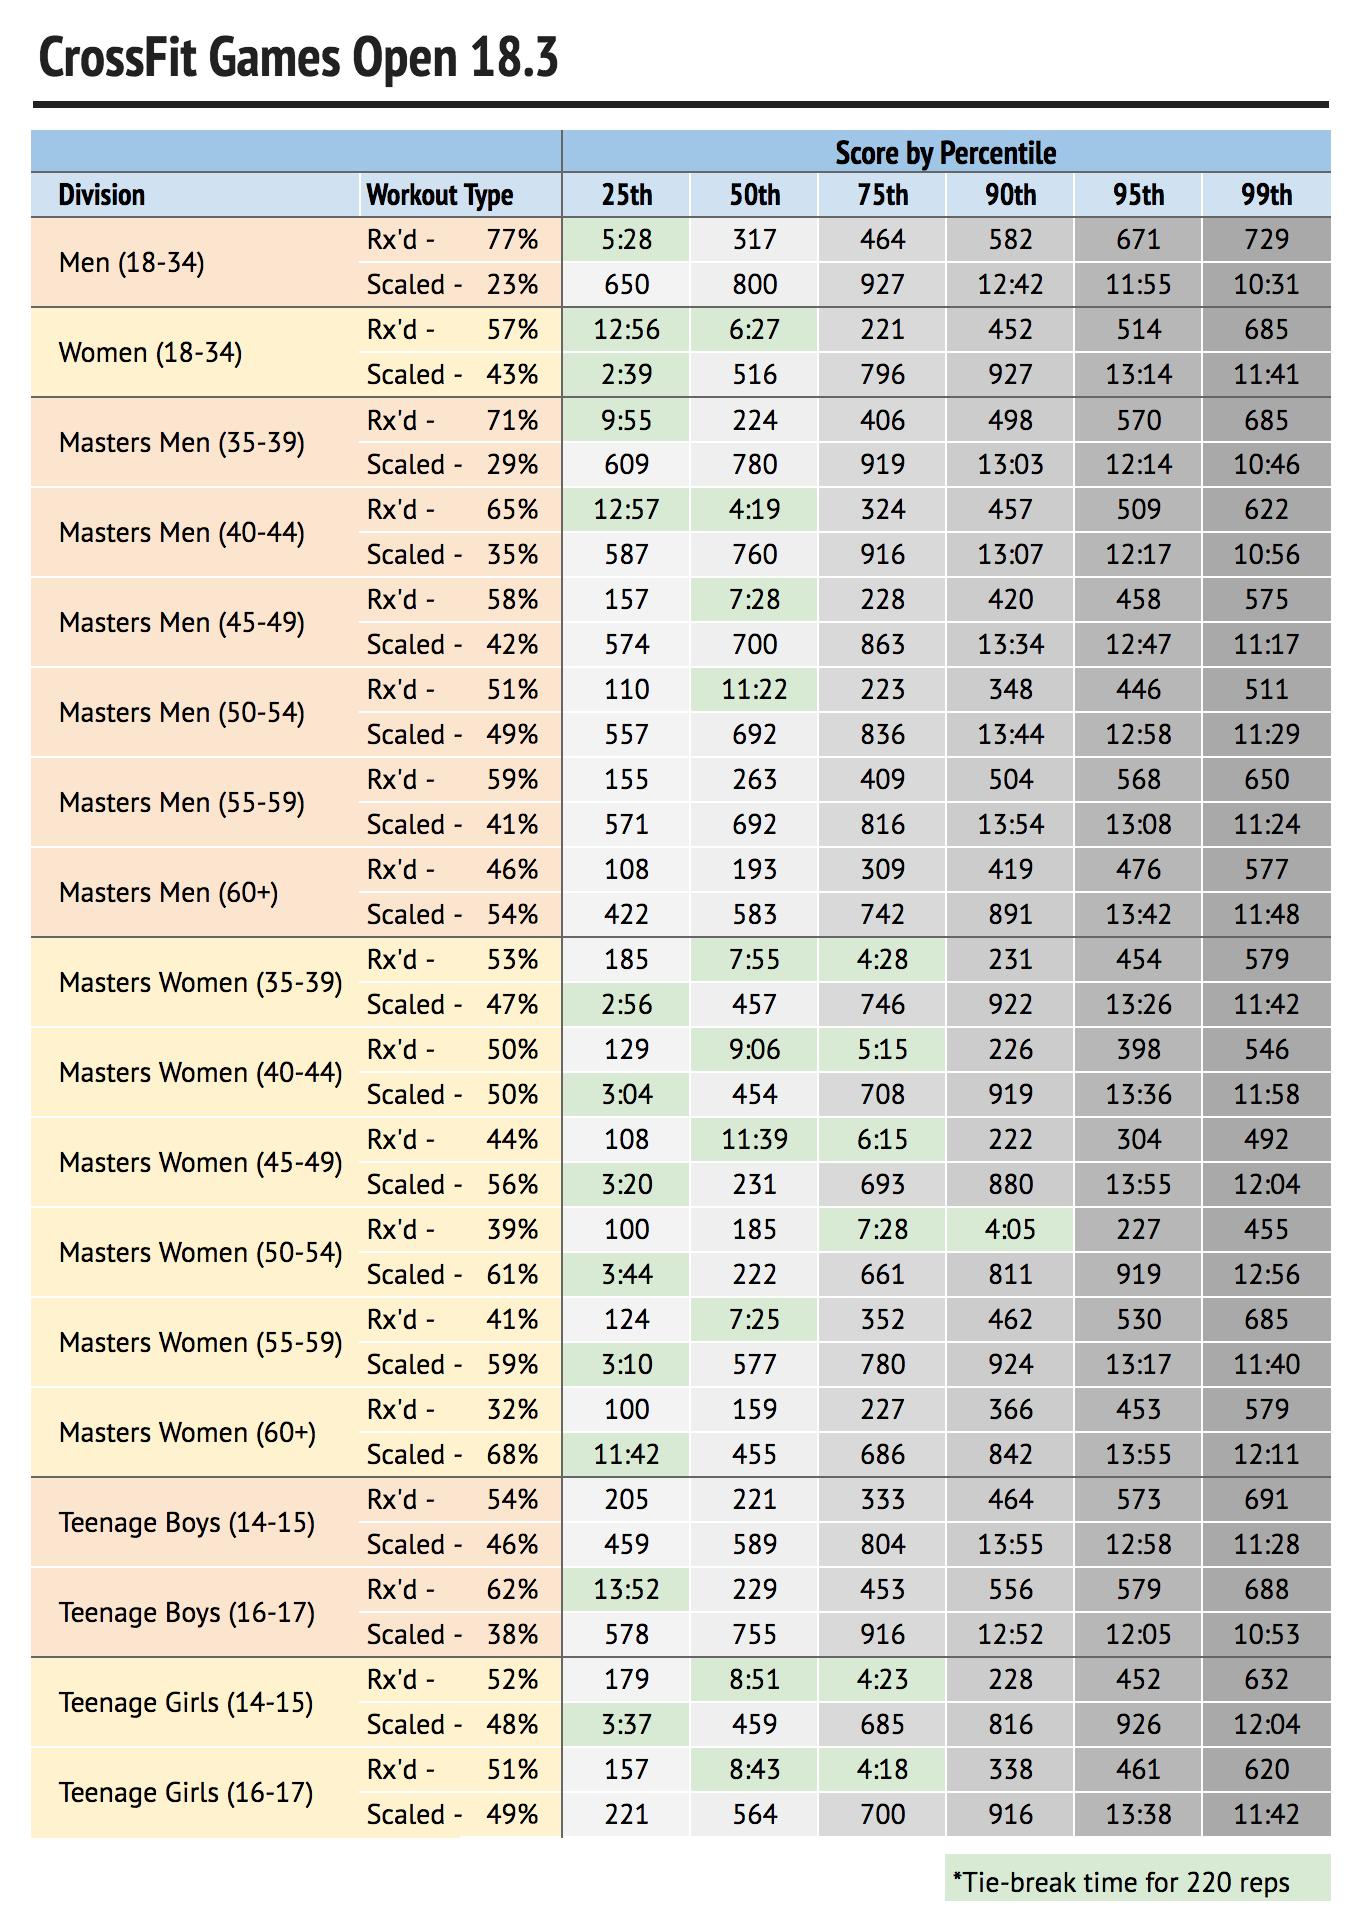 Open Workout 18.3 percentiles